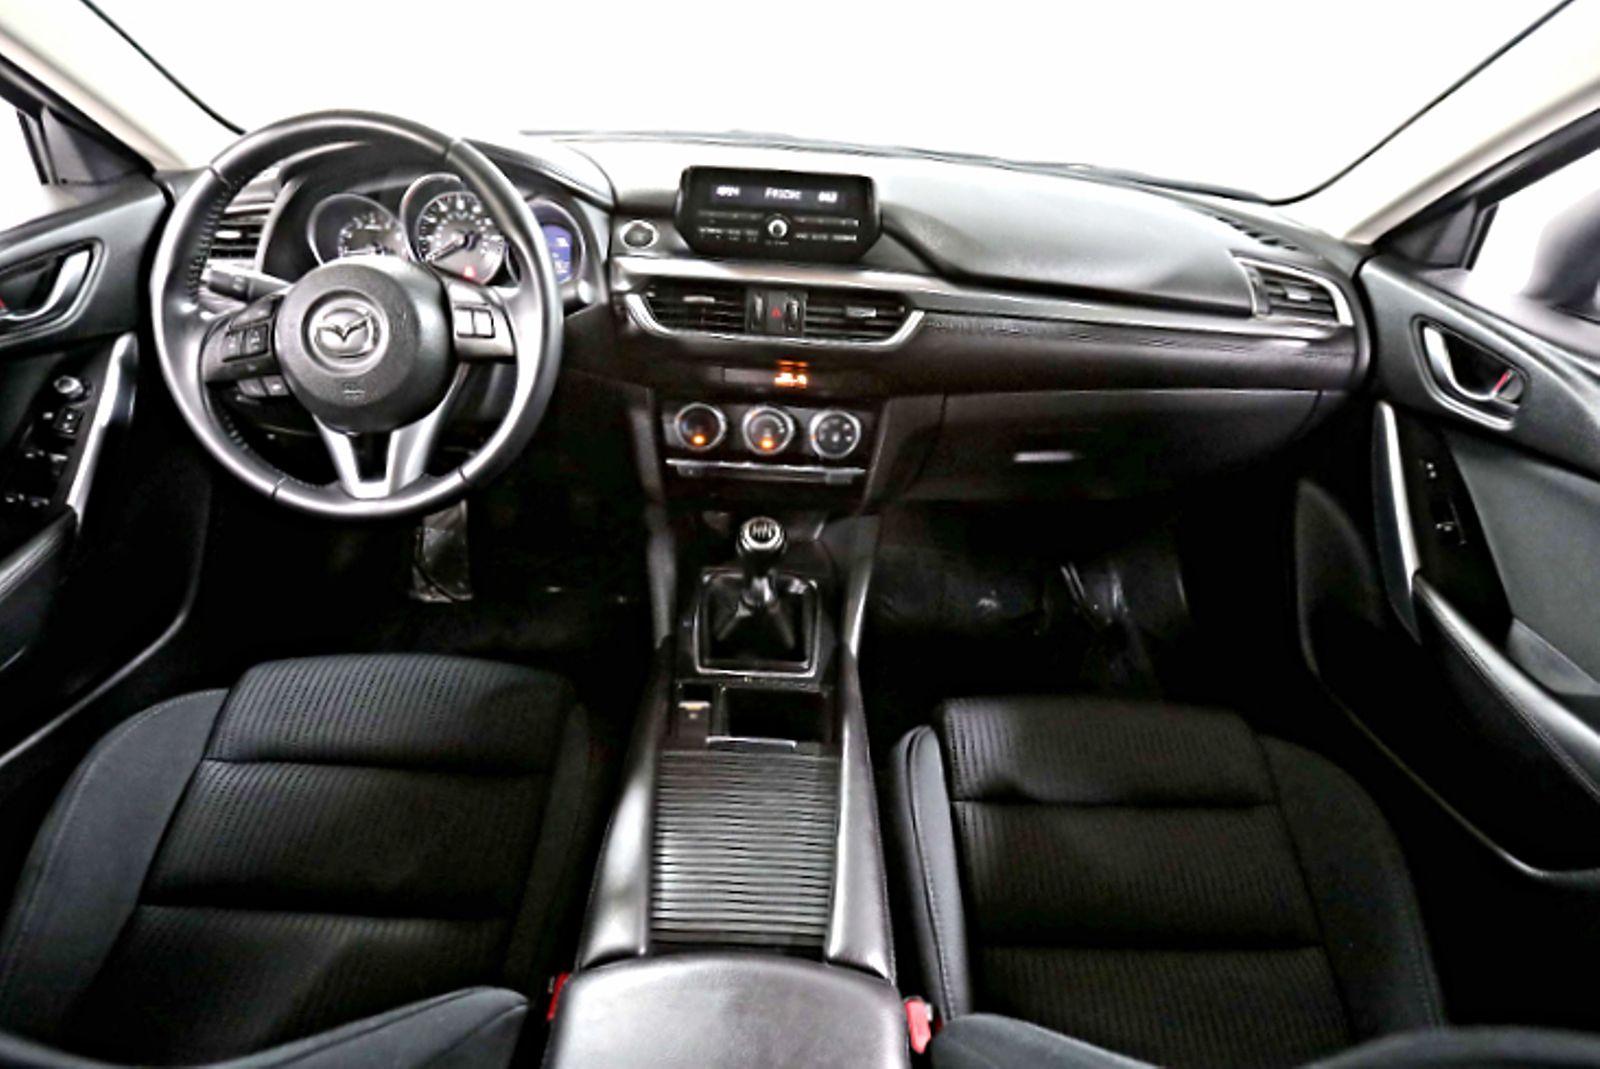 ... 2016 Mazda Mazda6 I Sport   Manual Transmission   Only 33K Miles City  California MDK International ...